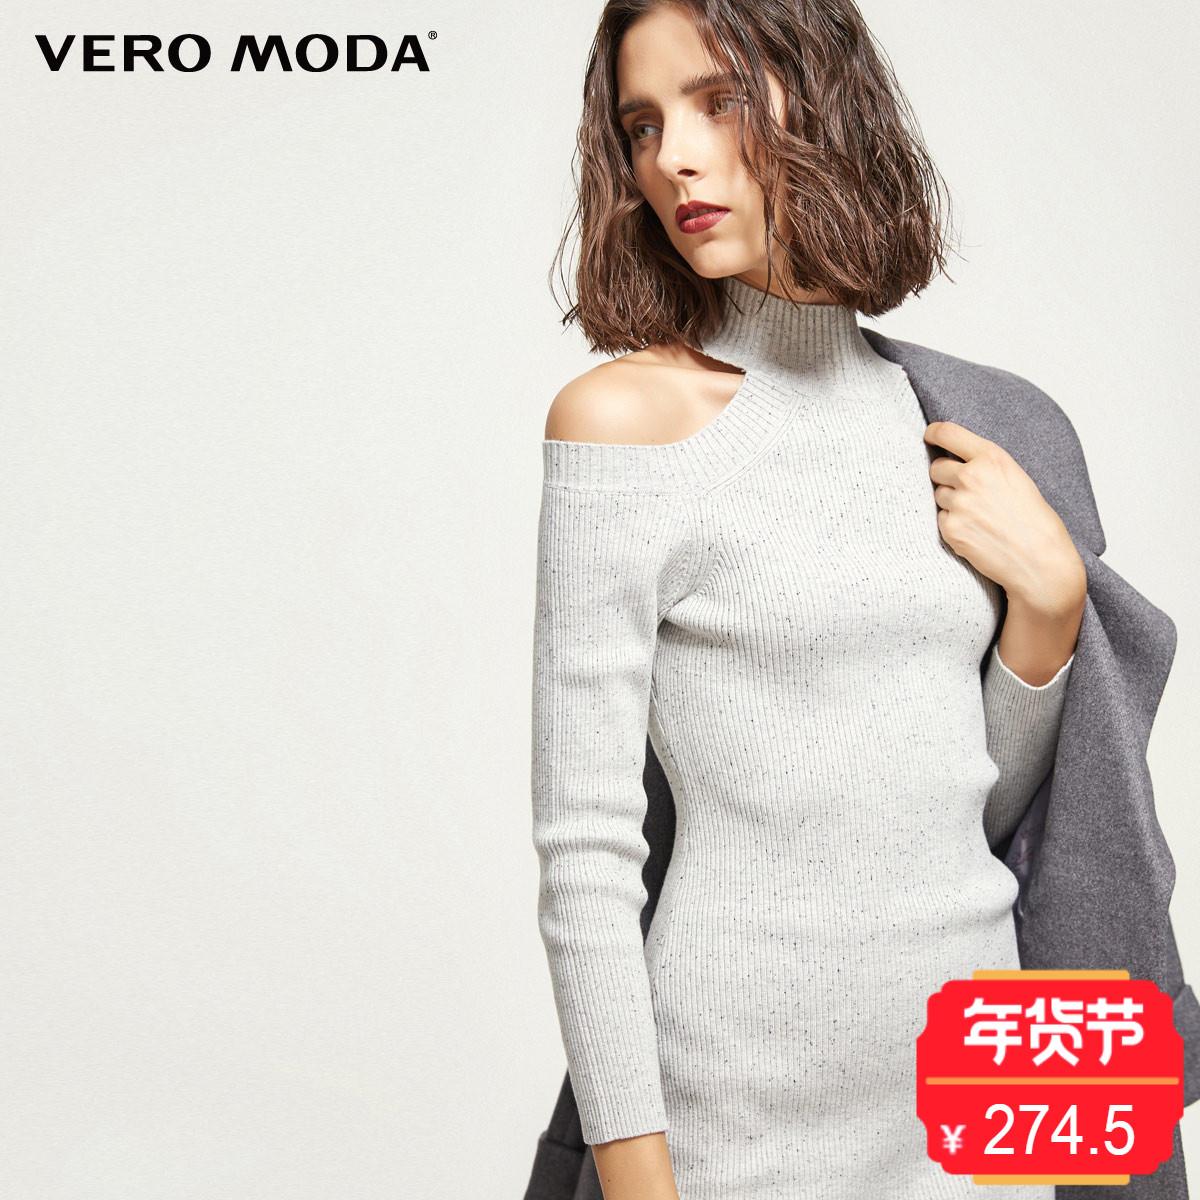 Vero Moda2017秋季新款露肩罗纹领修身针织连衣裙 317346517